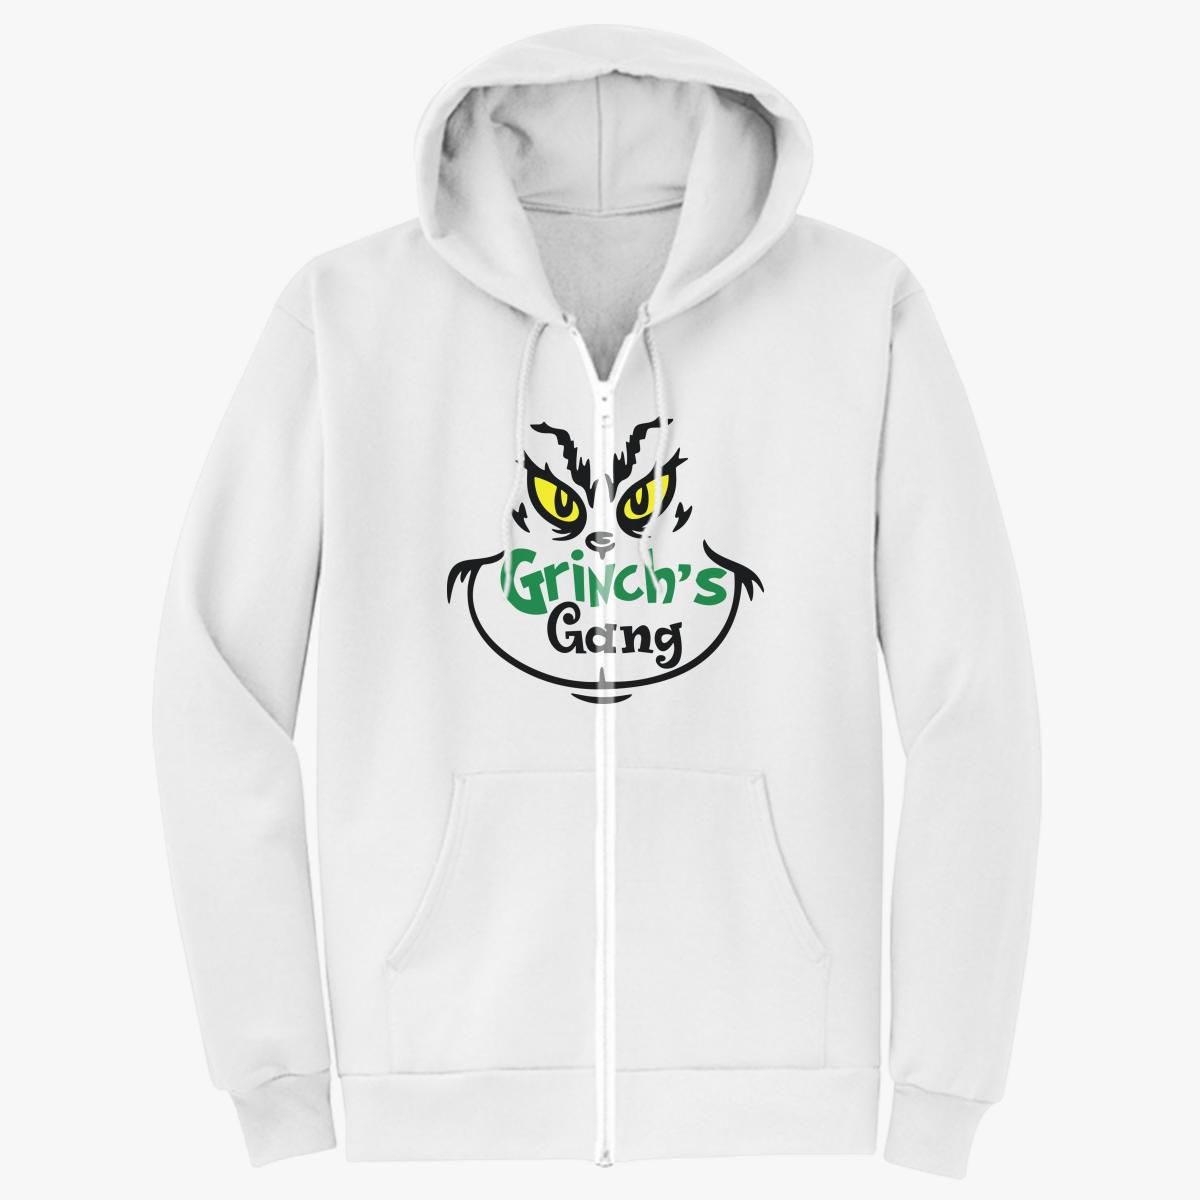 Grinch's Gang, Grinch T-Shirt Unisex Zip-Up Hoodie - Customon